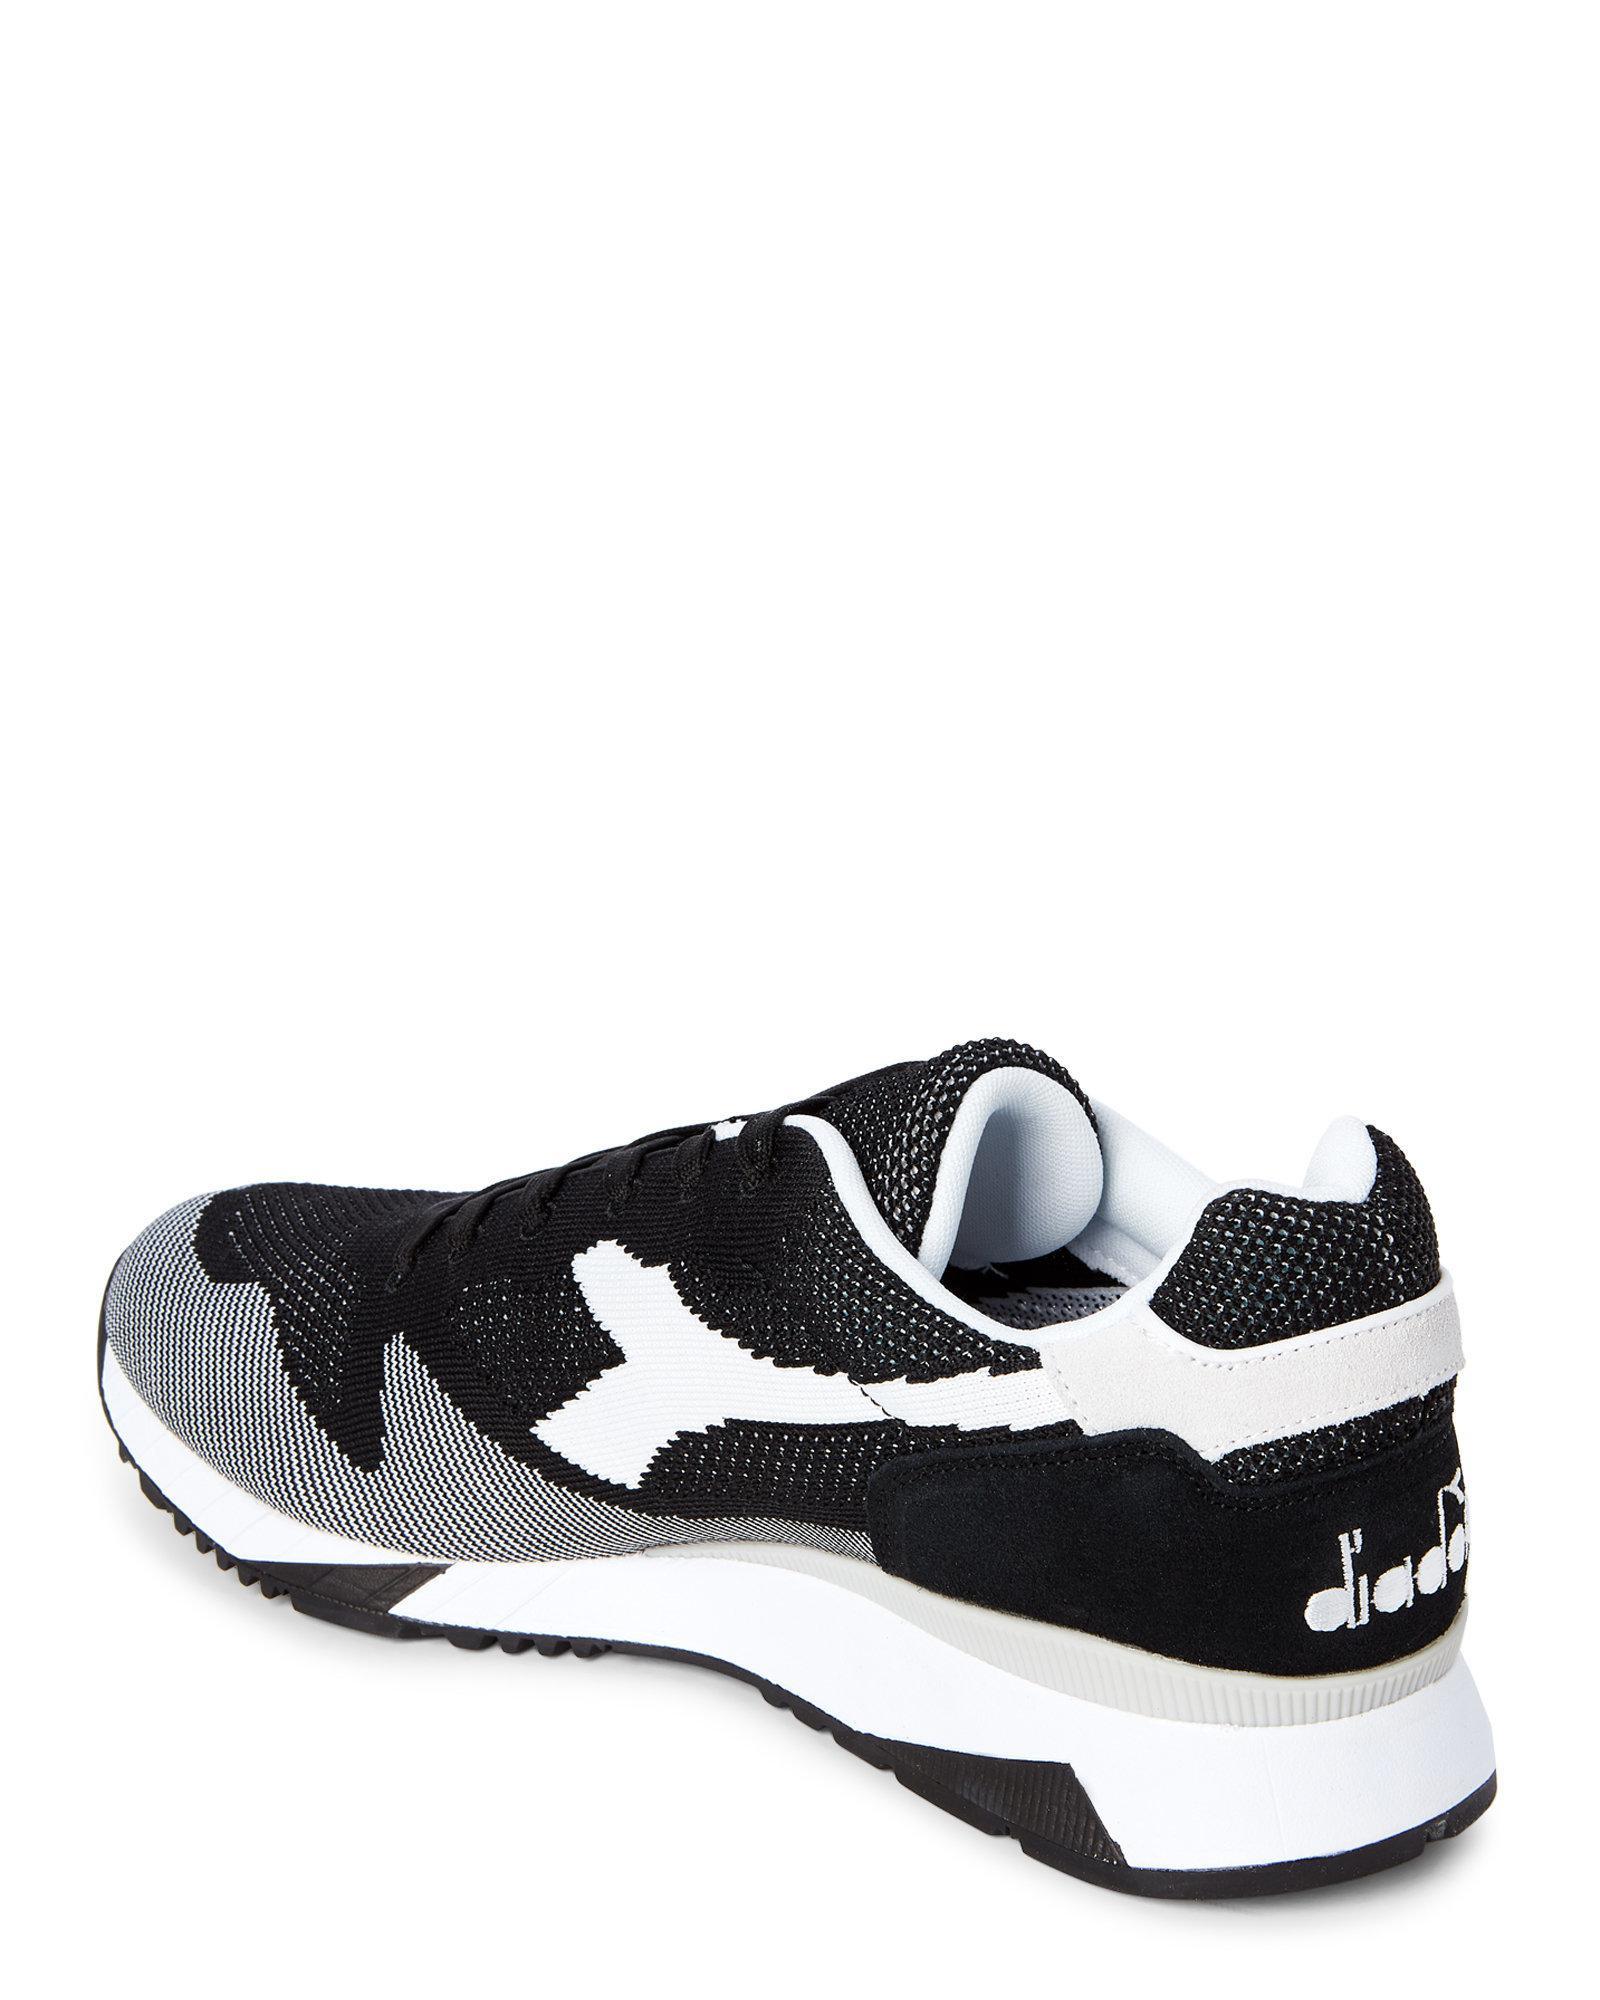 Lyst - Diadora Black   White V7000 Weave Jogger Sneakers in Black ... 245d4d047